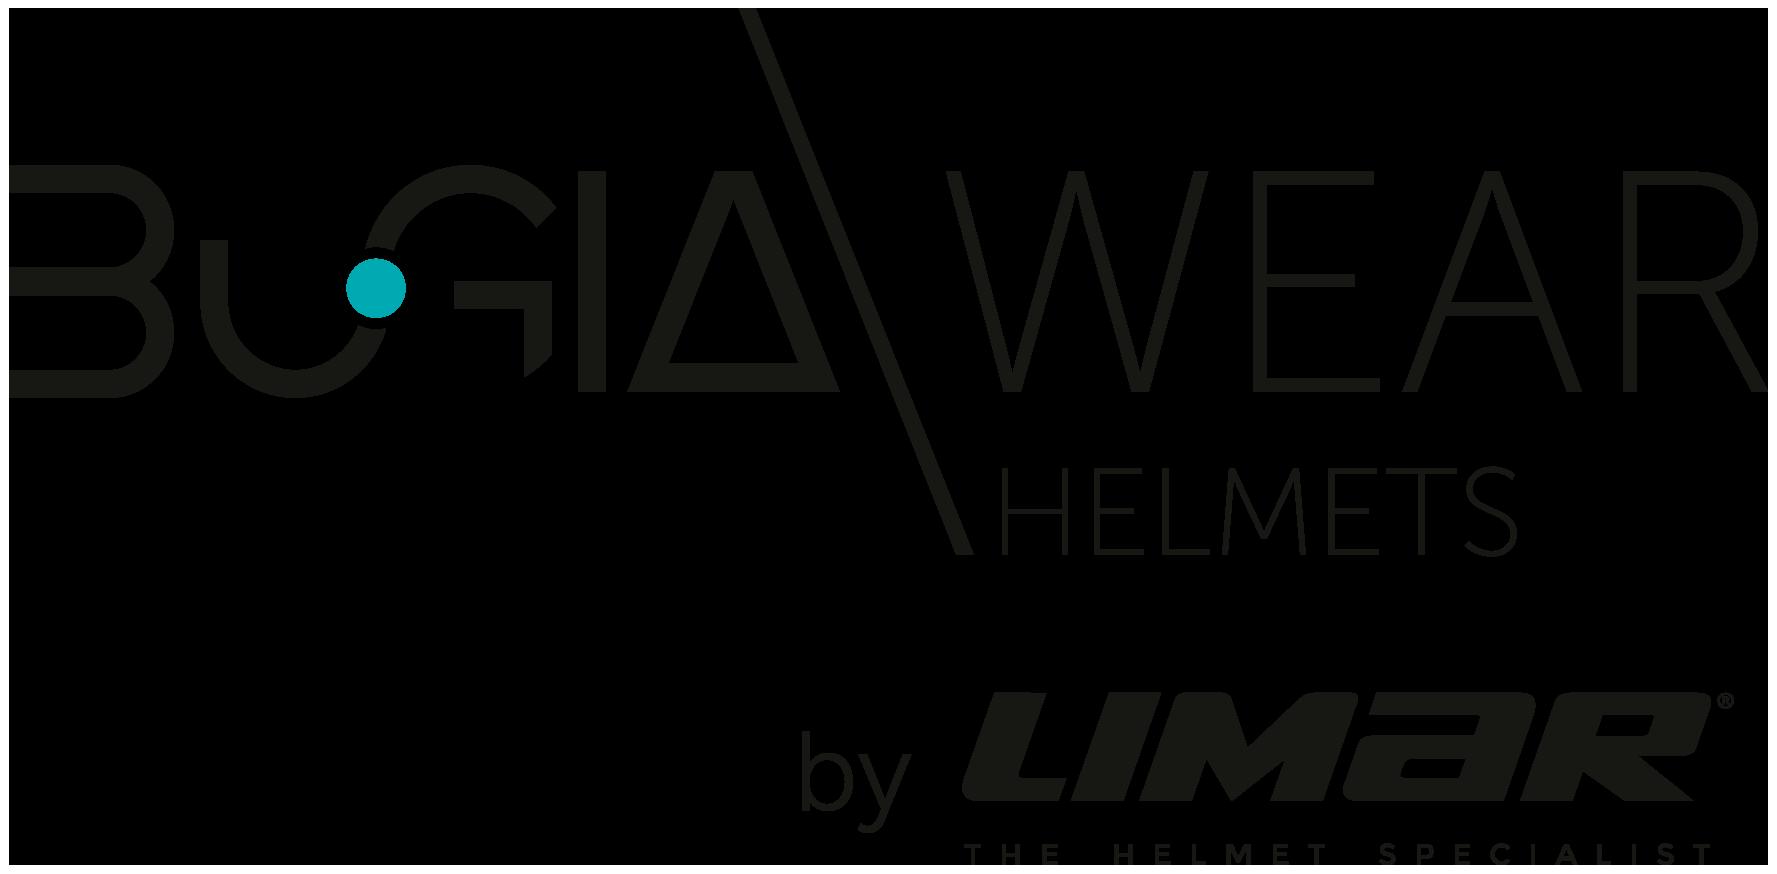 Bugia - Gianni Bugno - BugiaWear Helmets by Limar